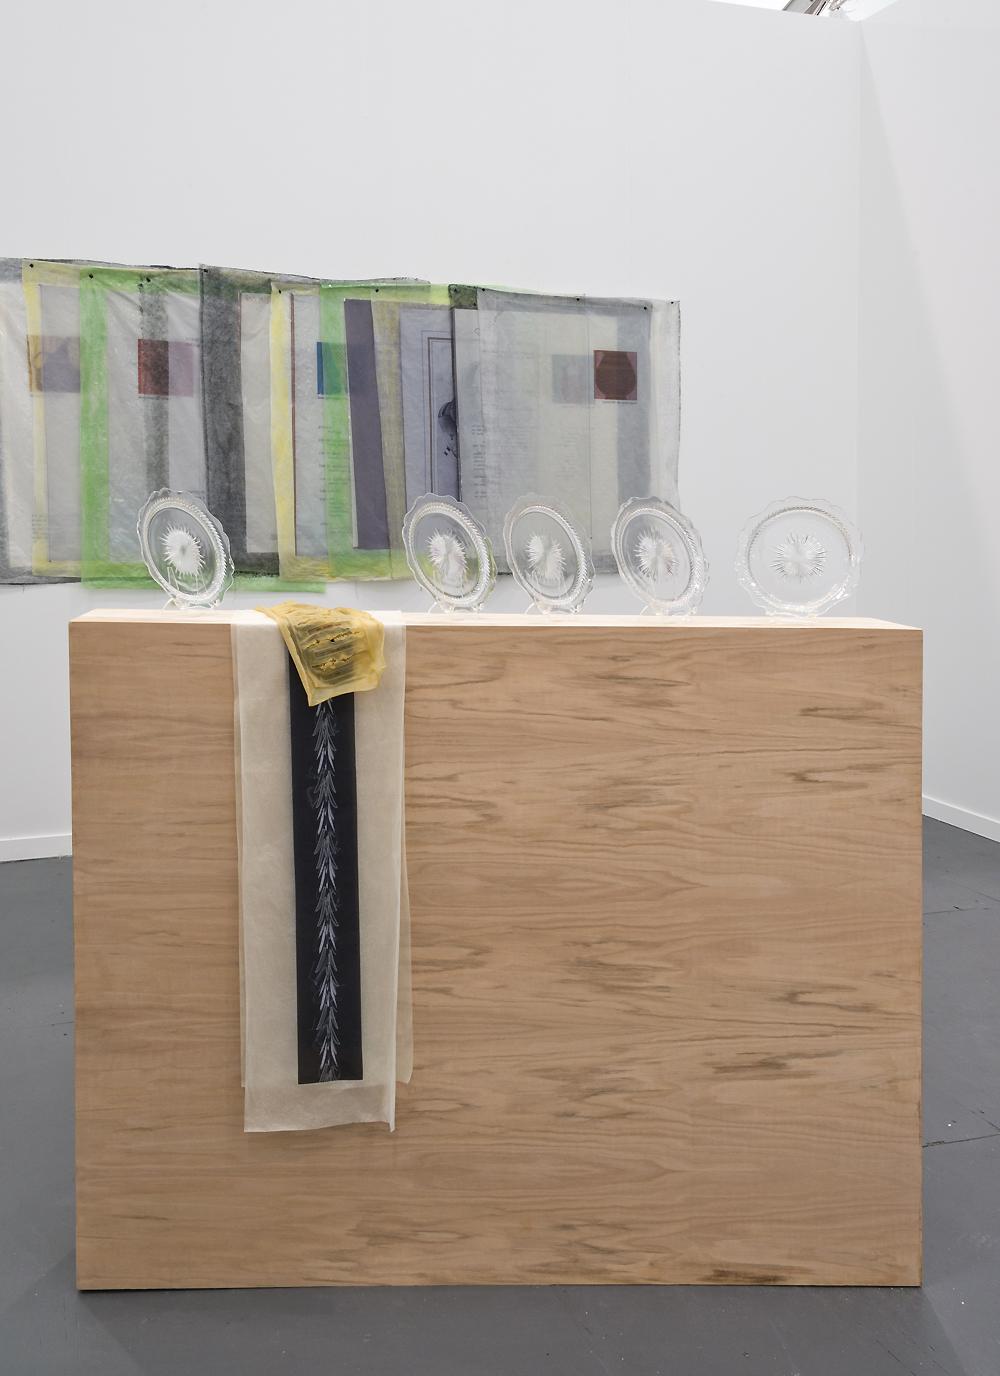 Valerie Snobeck / Catherine Sullivan,  Limited Good 4 , 2013, depression glass, latex, wood, peeled print and felt on plastic, 56.5 x 60 x 8.5 inch